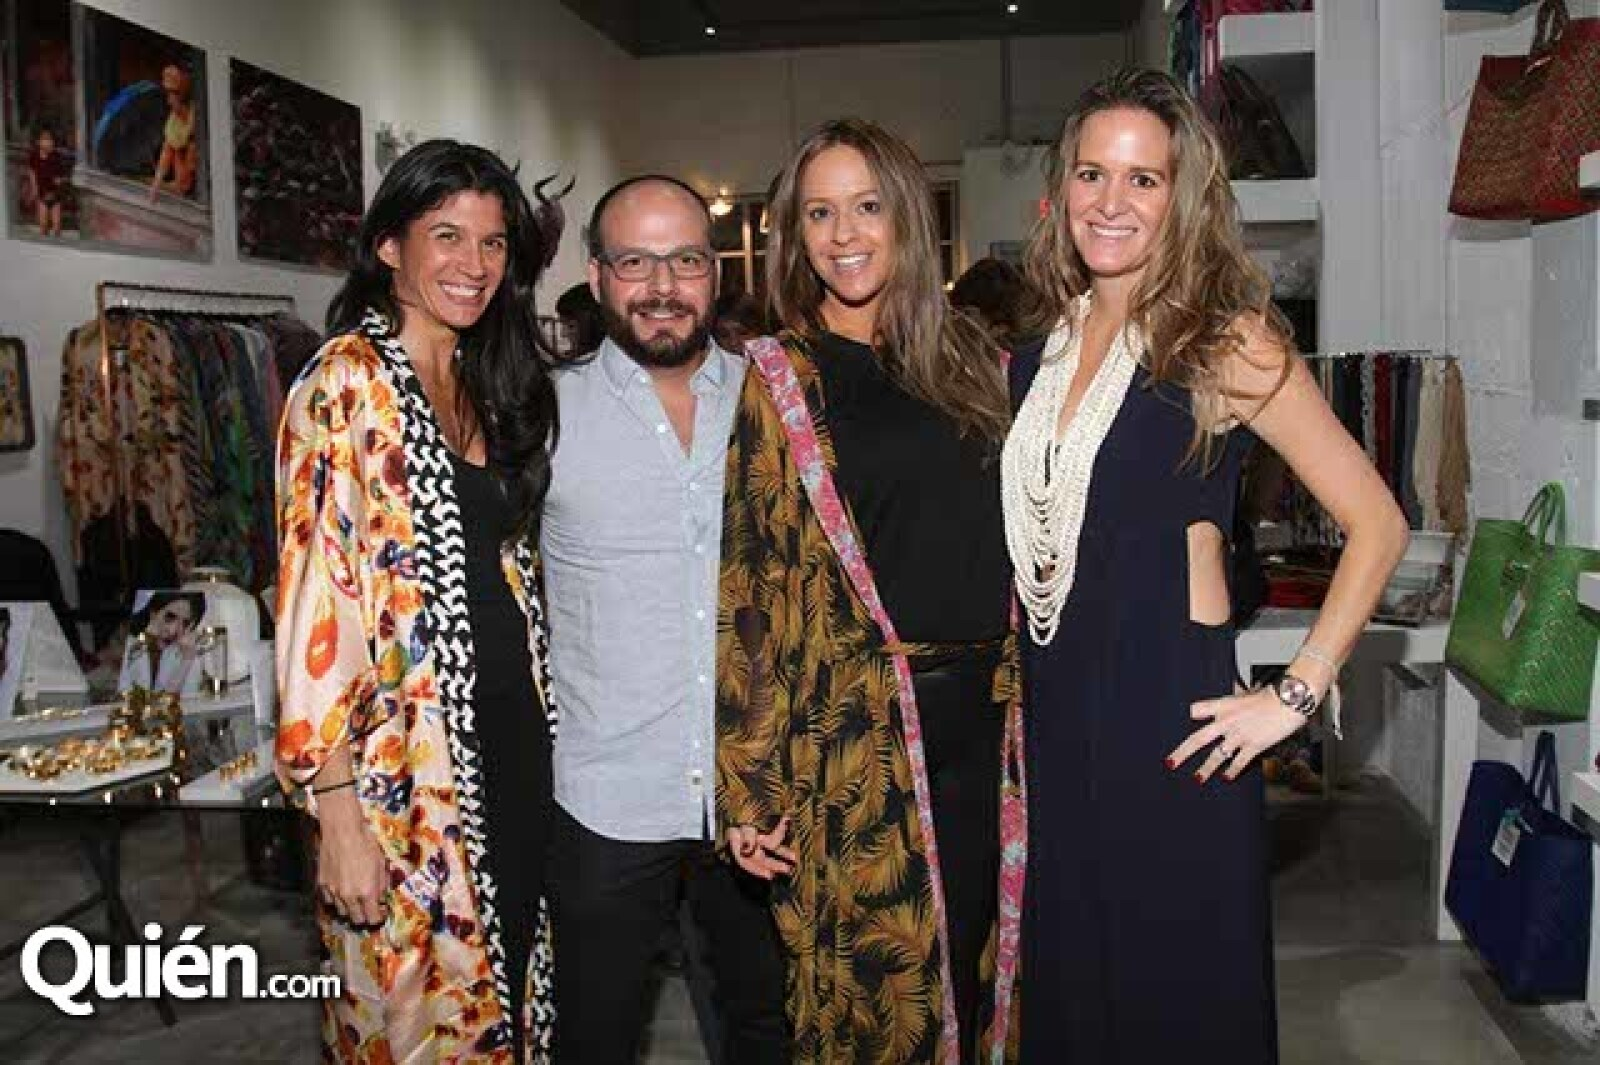 Ana Faría, Carlos Gamus, Tal Lucher Agay y Romina Amkle